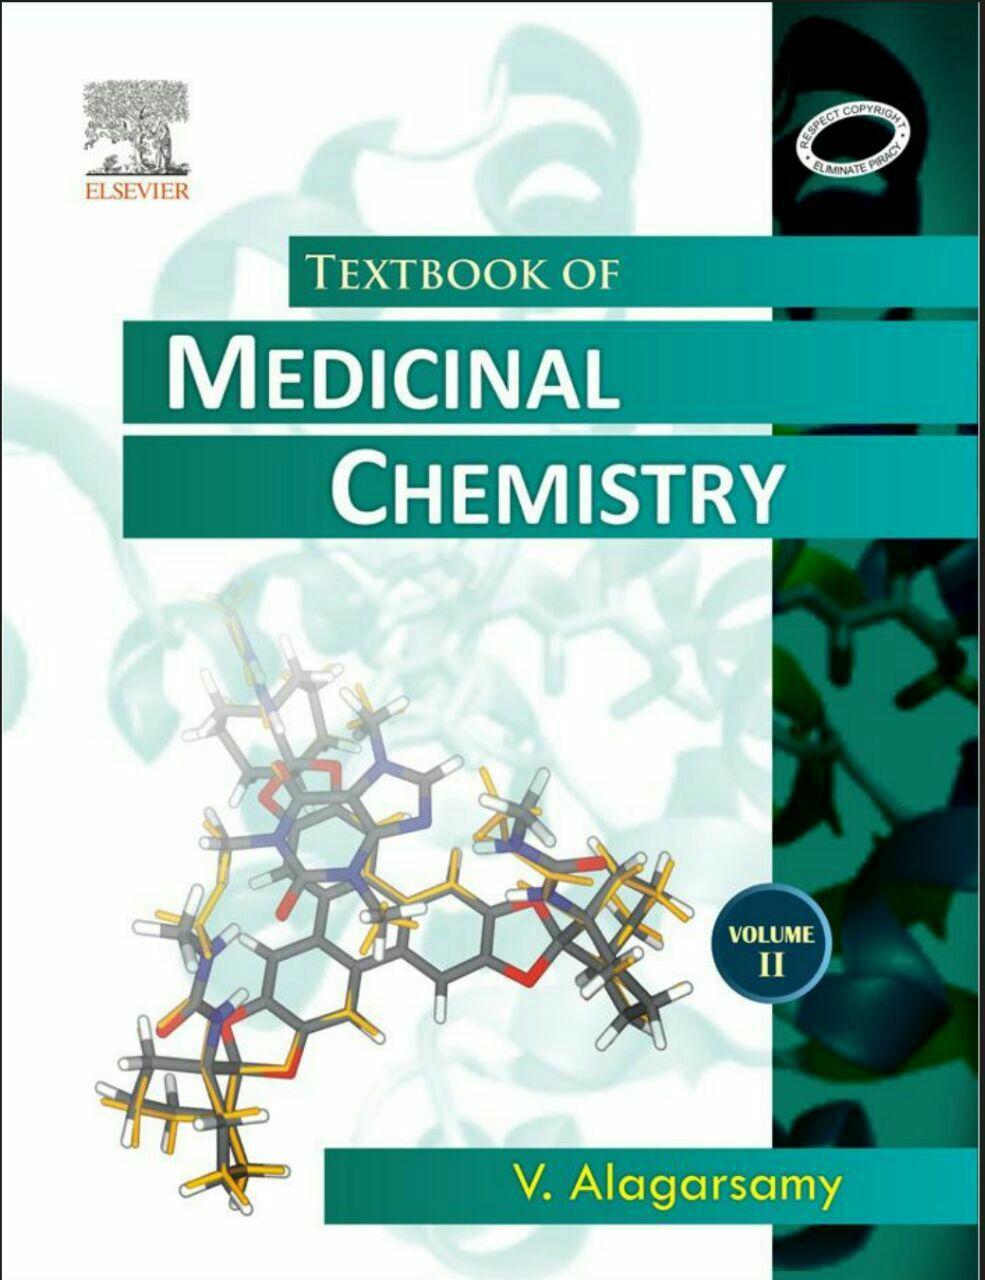 V. Alagarsamy TEXTBOOK OF MEDICINAL CHEMISTRY Volume II PDF download